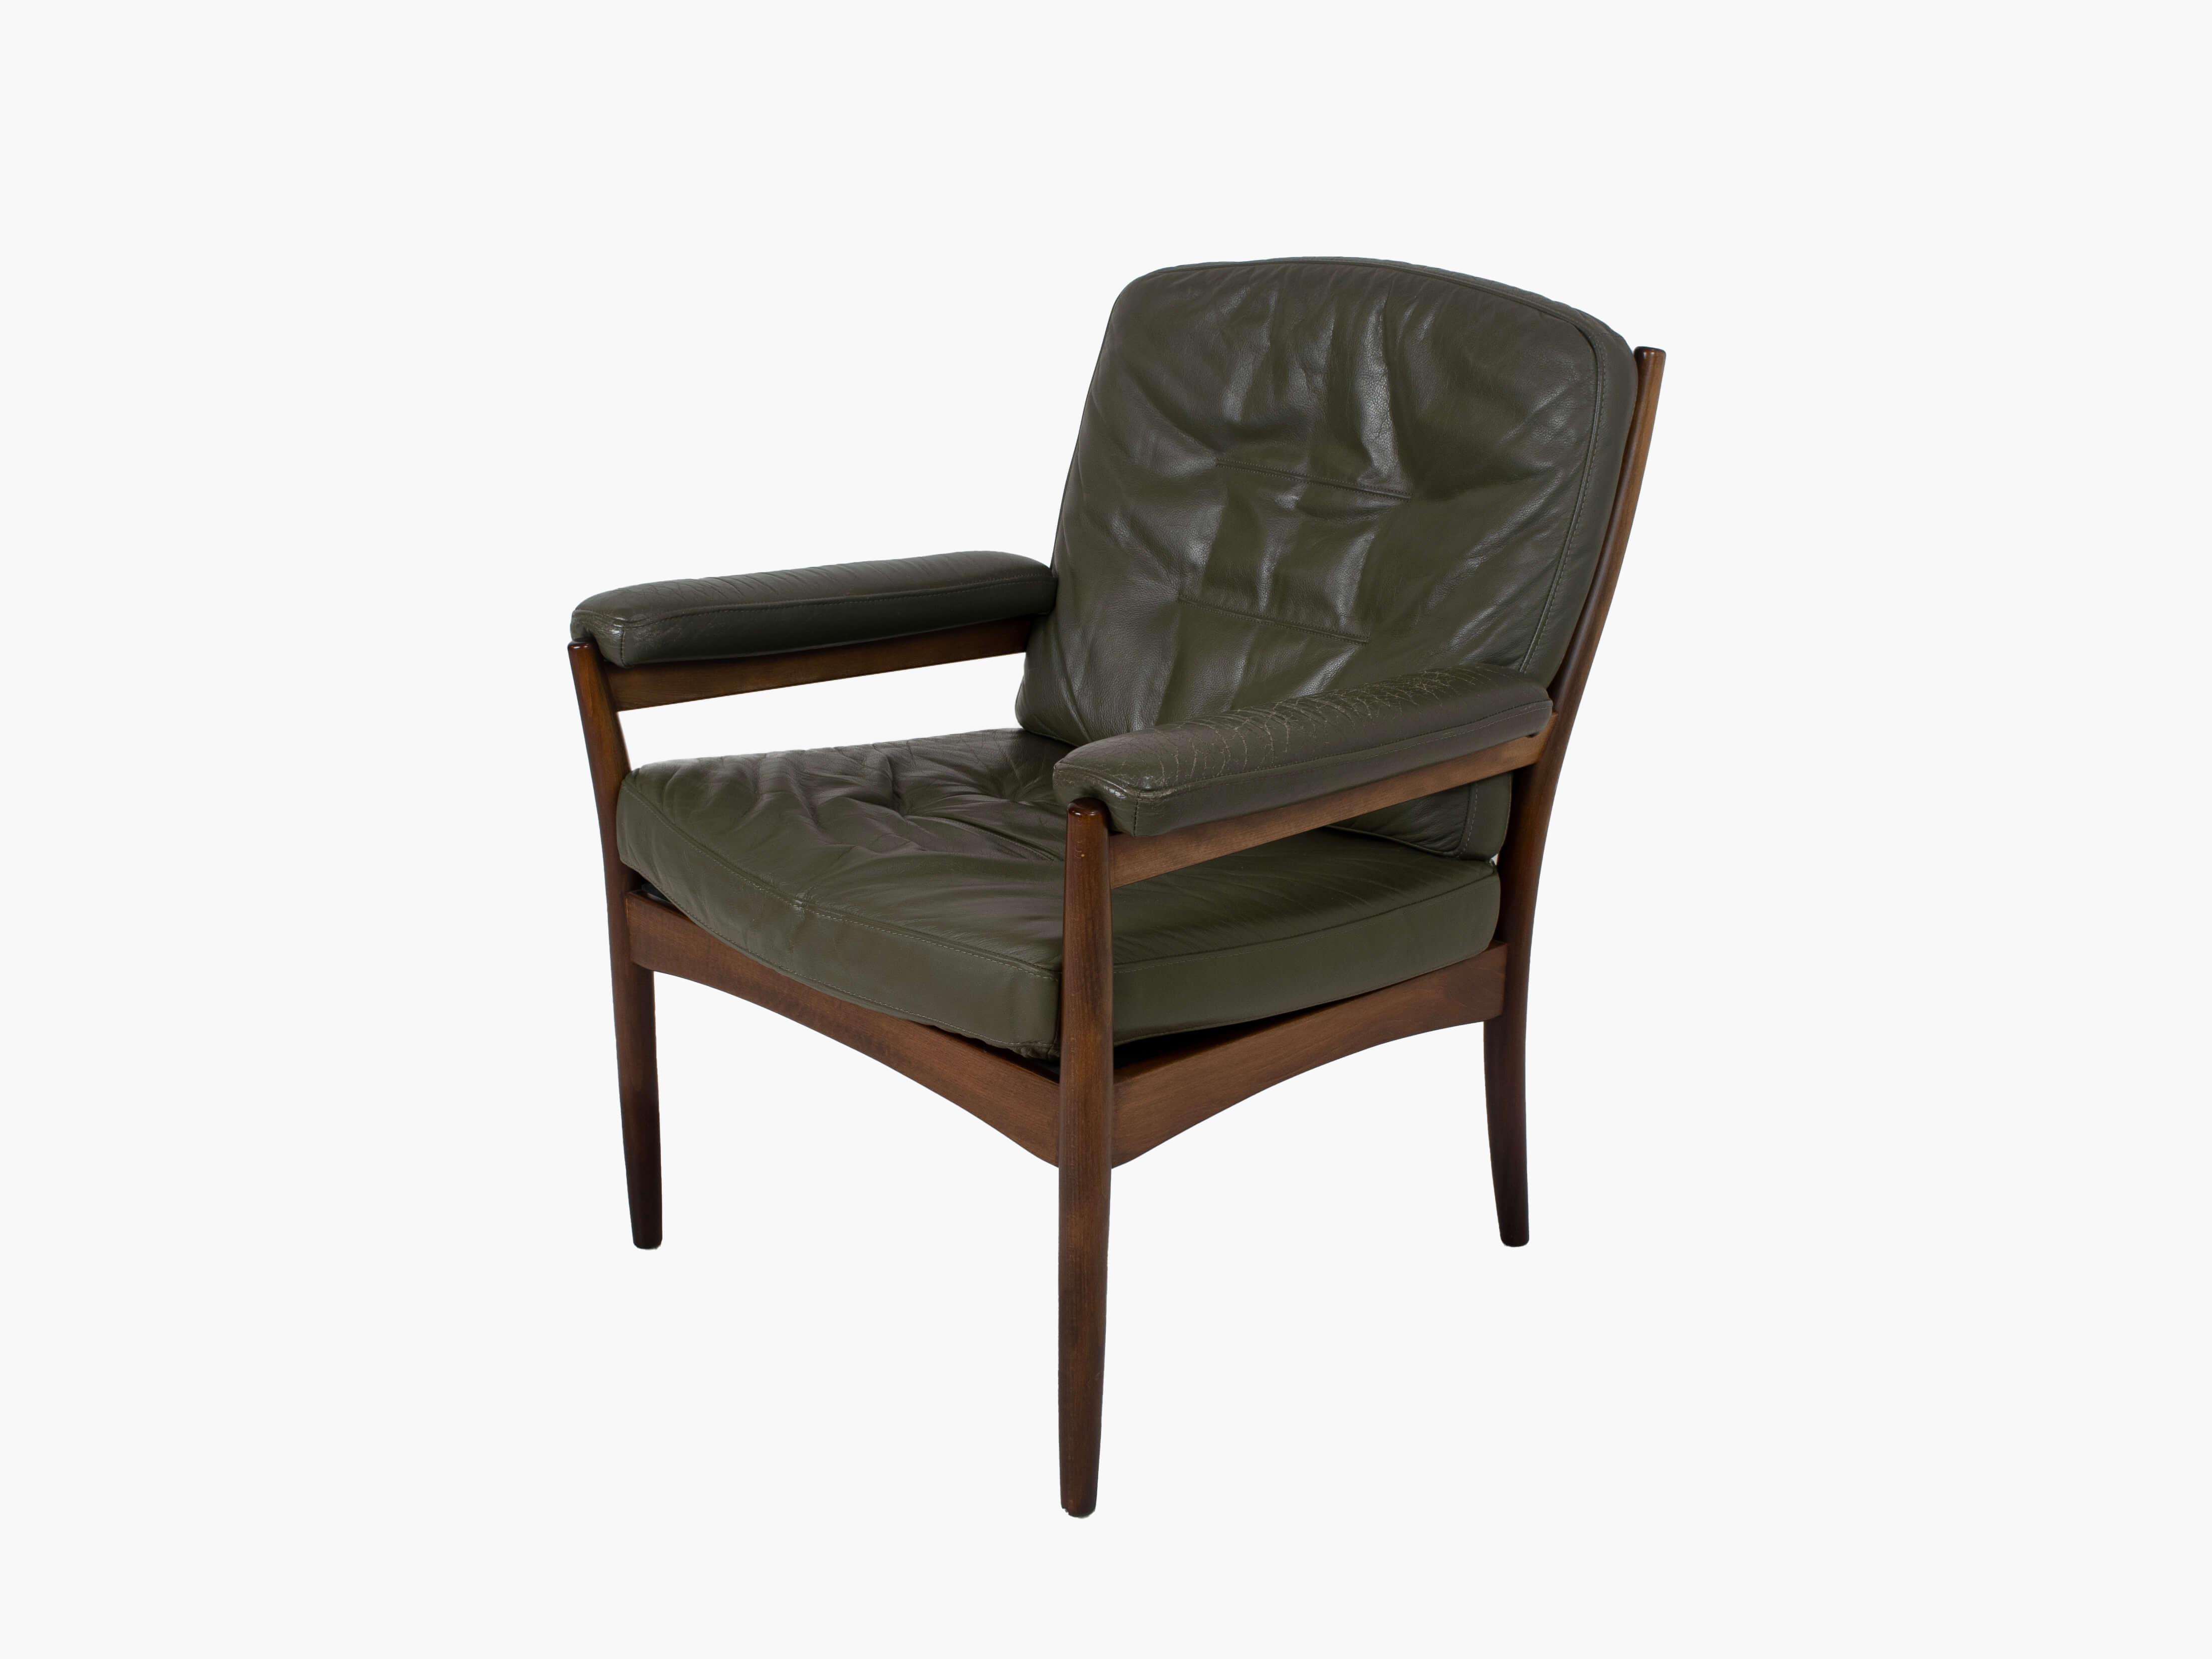 G-Mobel Easy Chair in Green Leather for Göte Möbler, Sweden 1970s